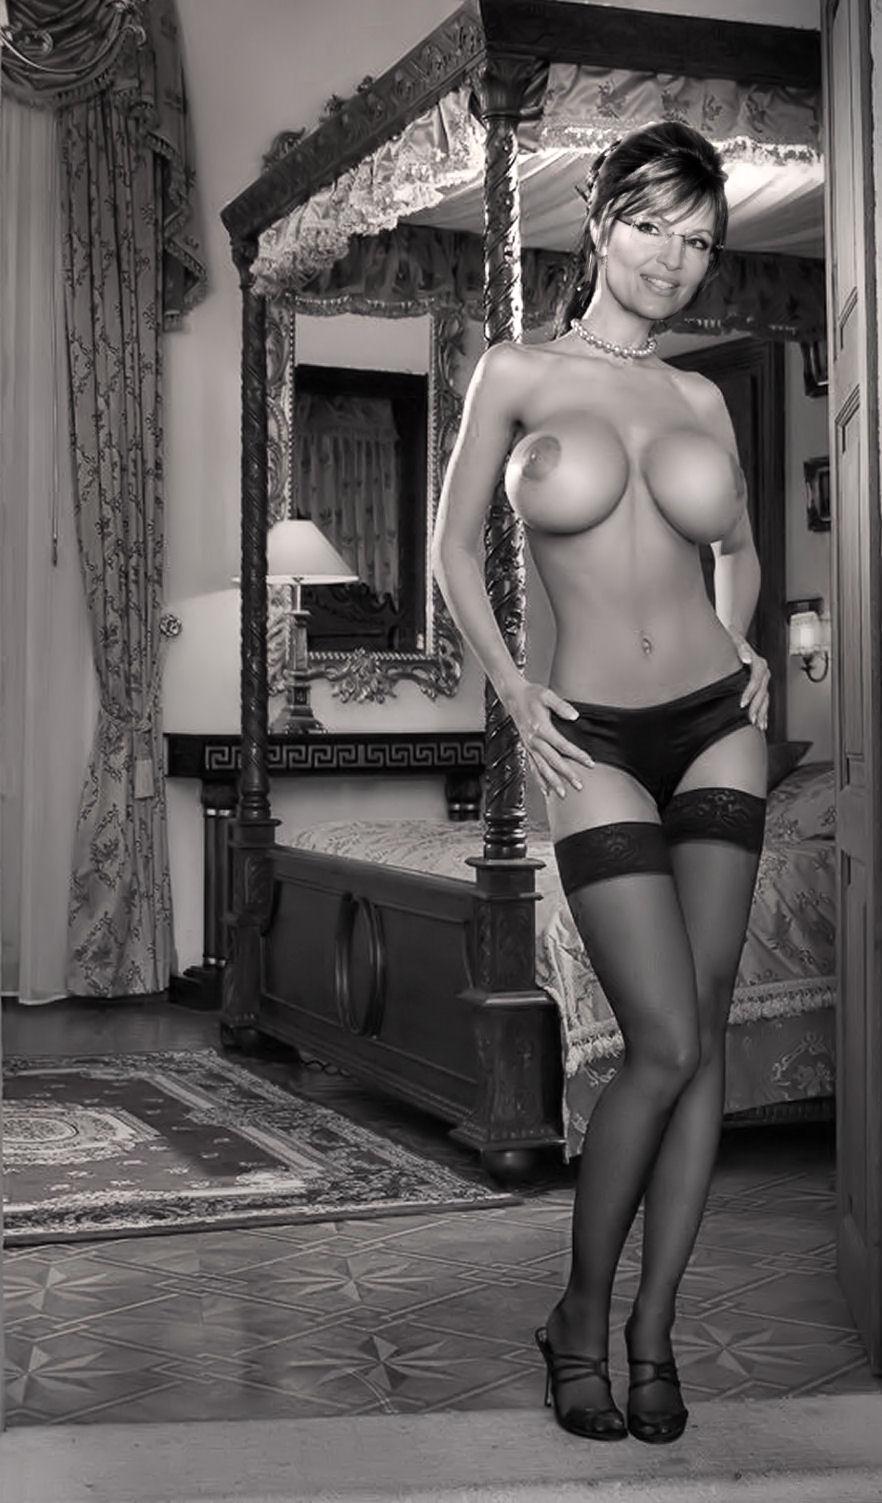 Sarah palin nude the fappening